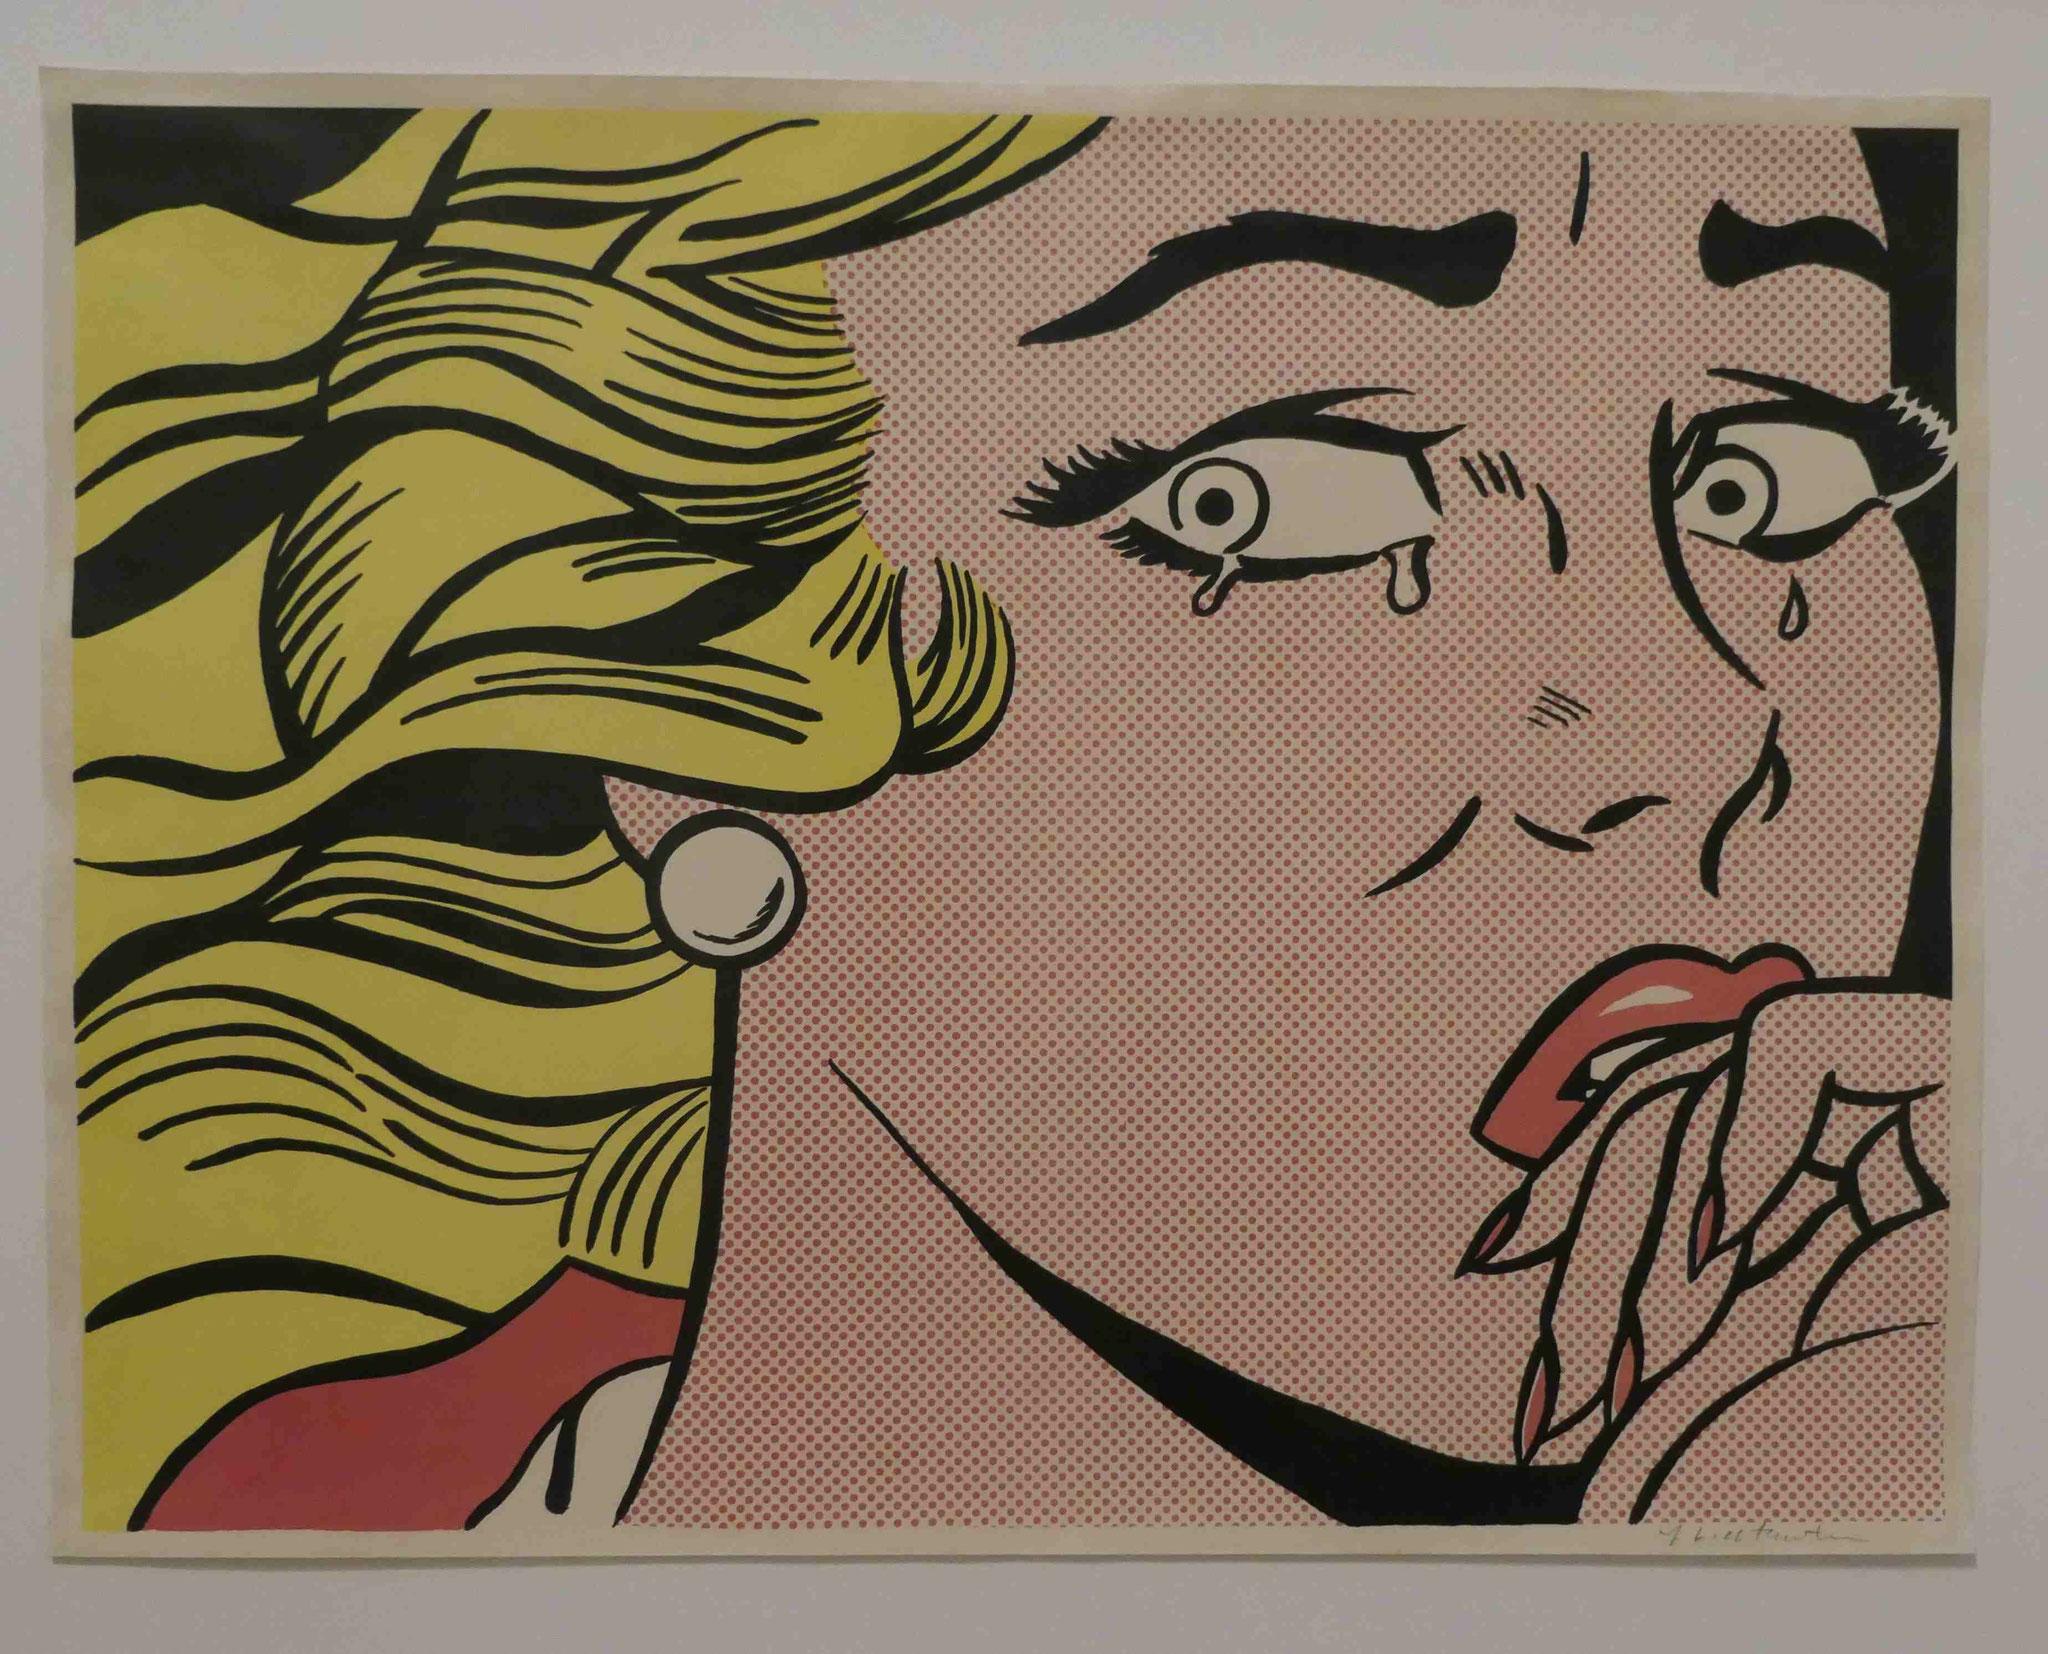 Roy Lichtenstein, Crying Girl, Offsetlithographie, 1963, Nationalgalerie Berlin